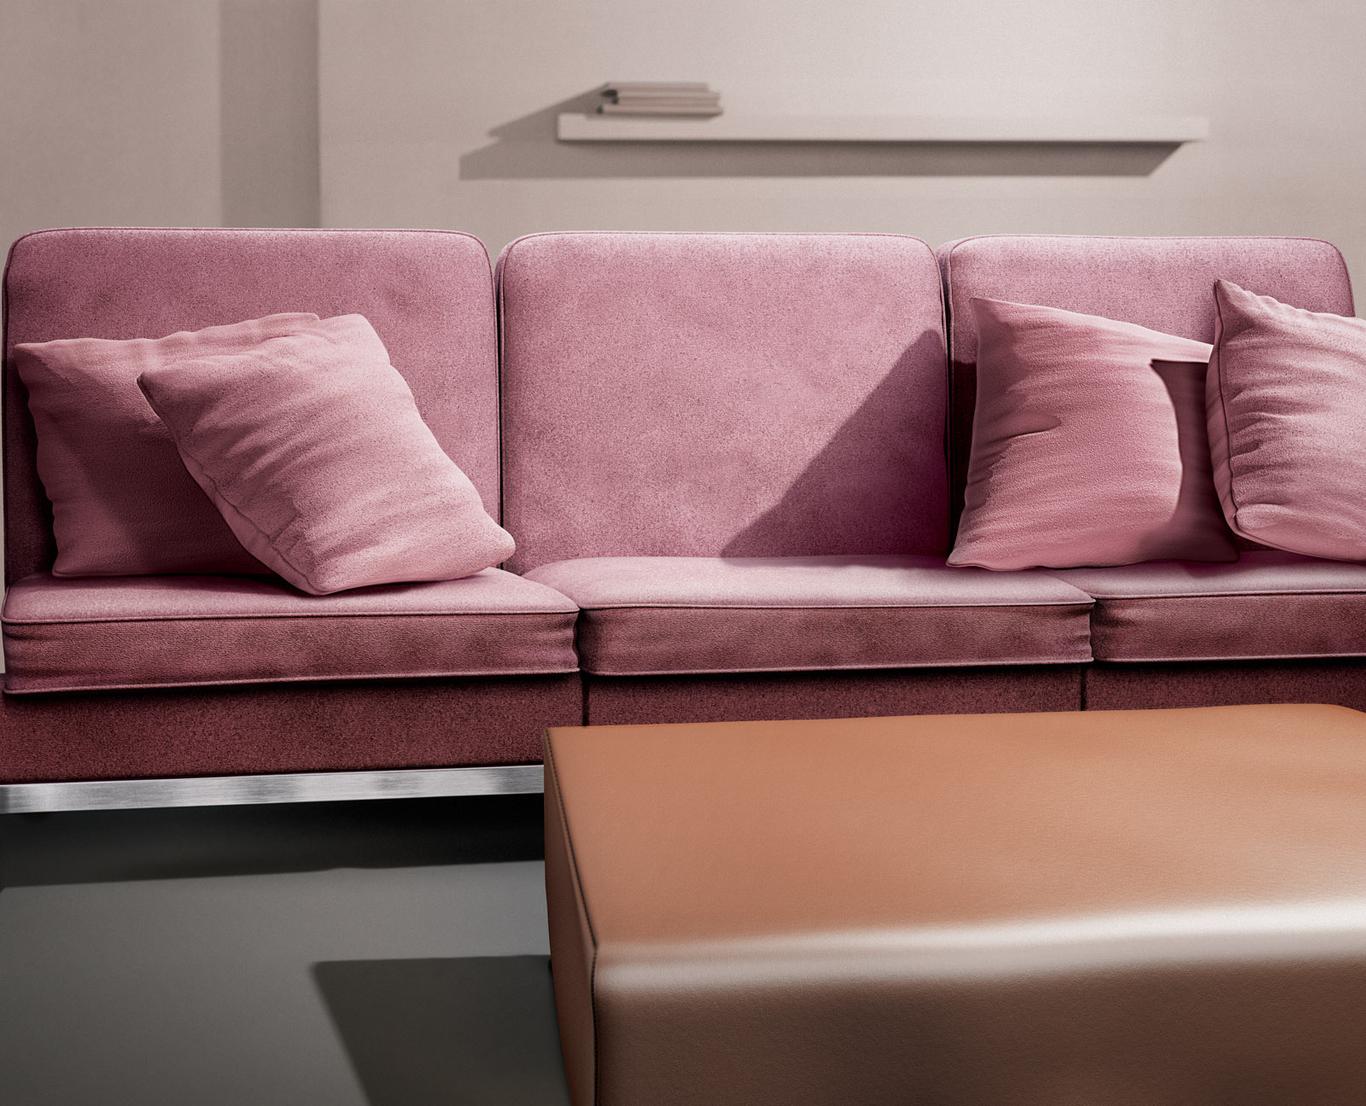 Marcelojr sofa 1 98d441b3 bx7j